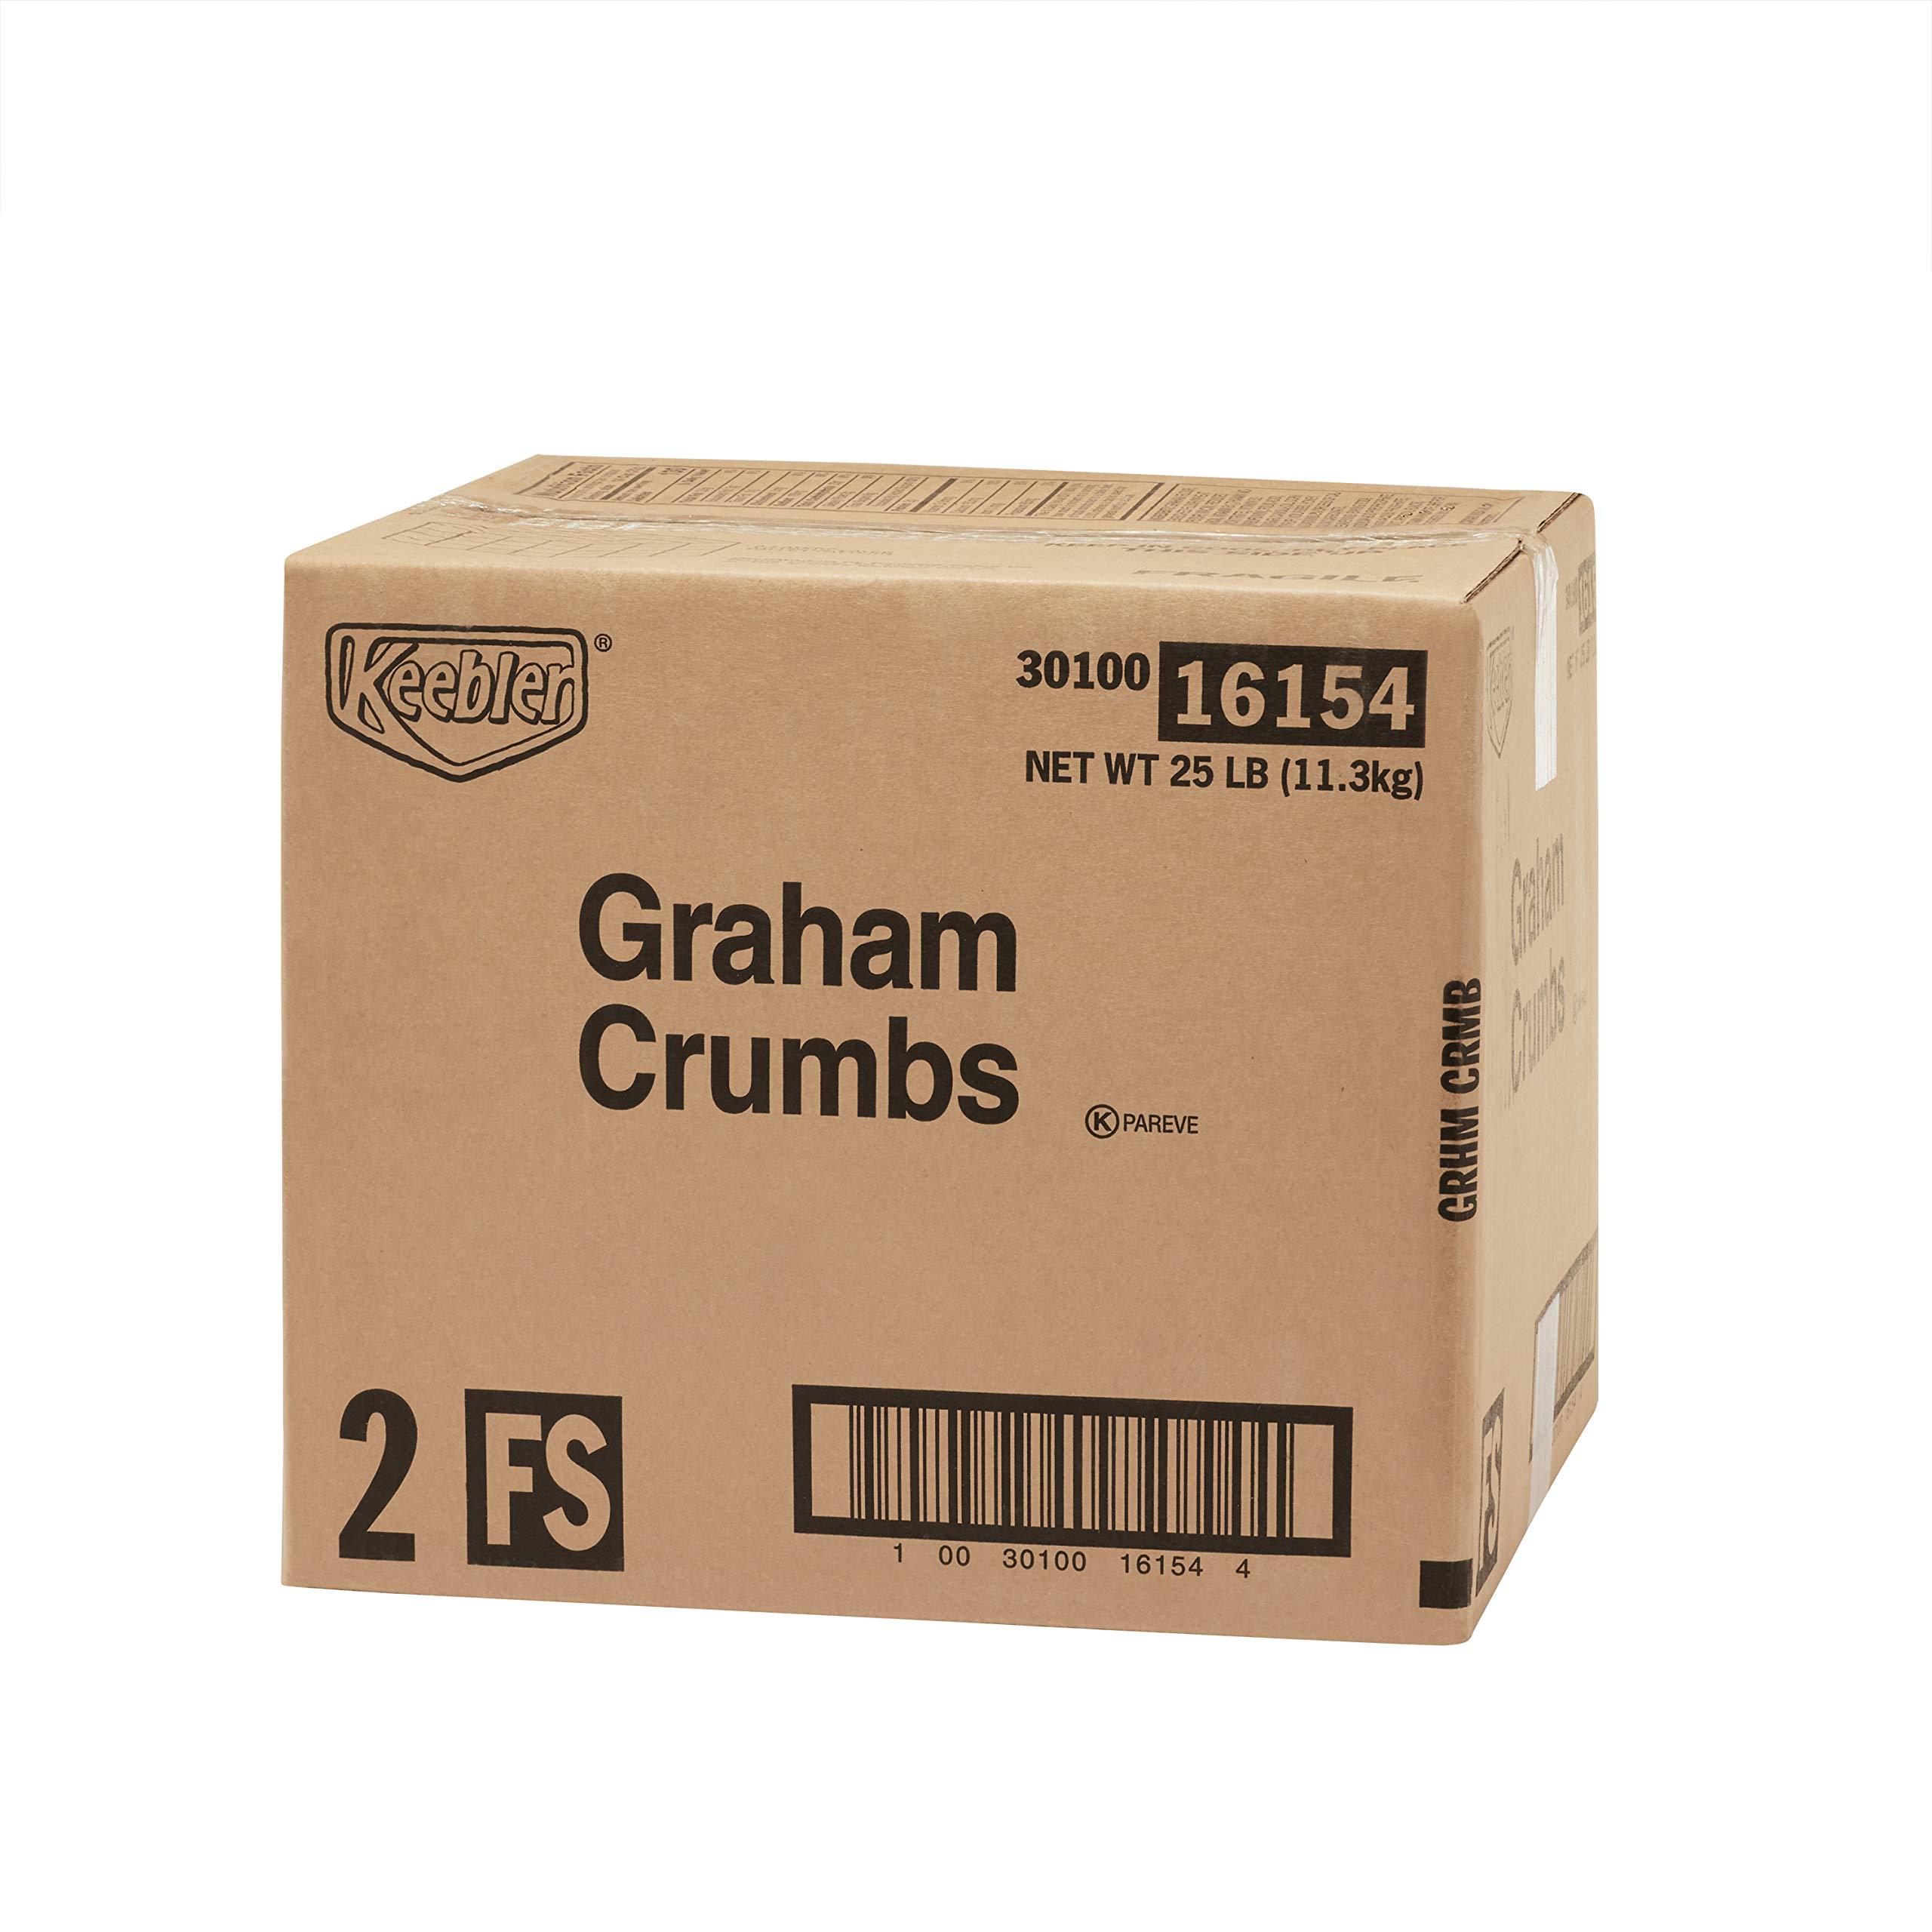 Keebler Graham Cracker Crumbs, 25 Pound by Keebler (Image #1)